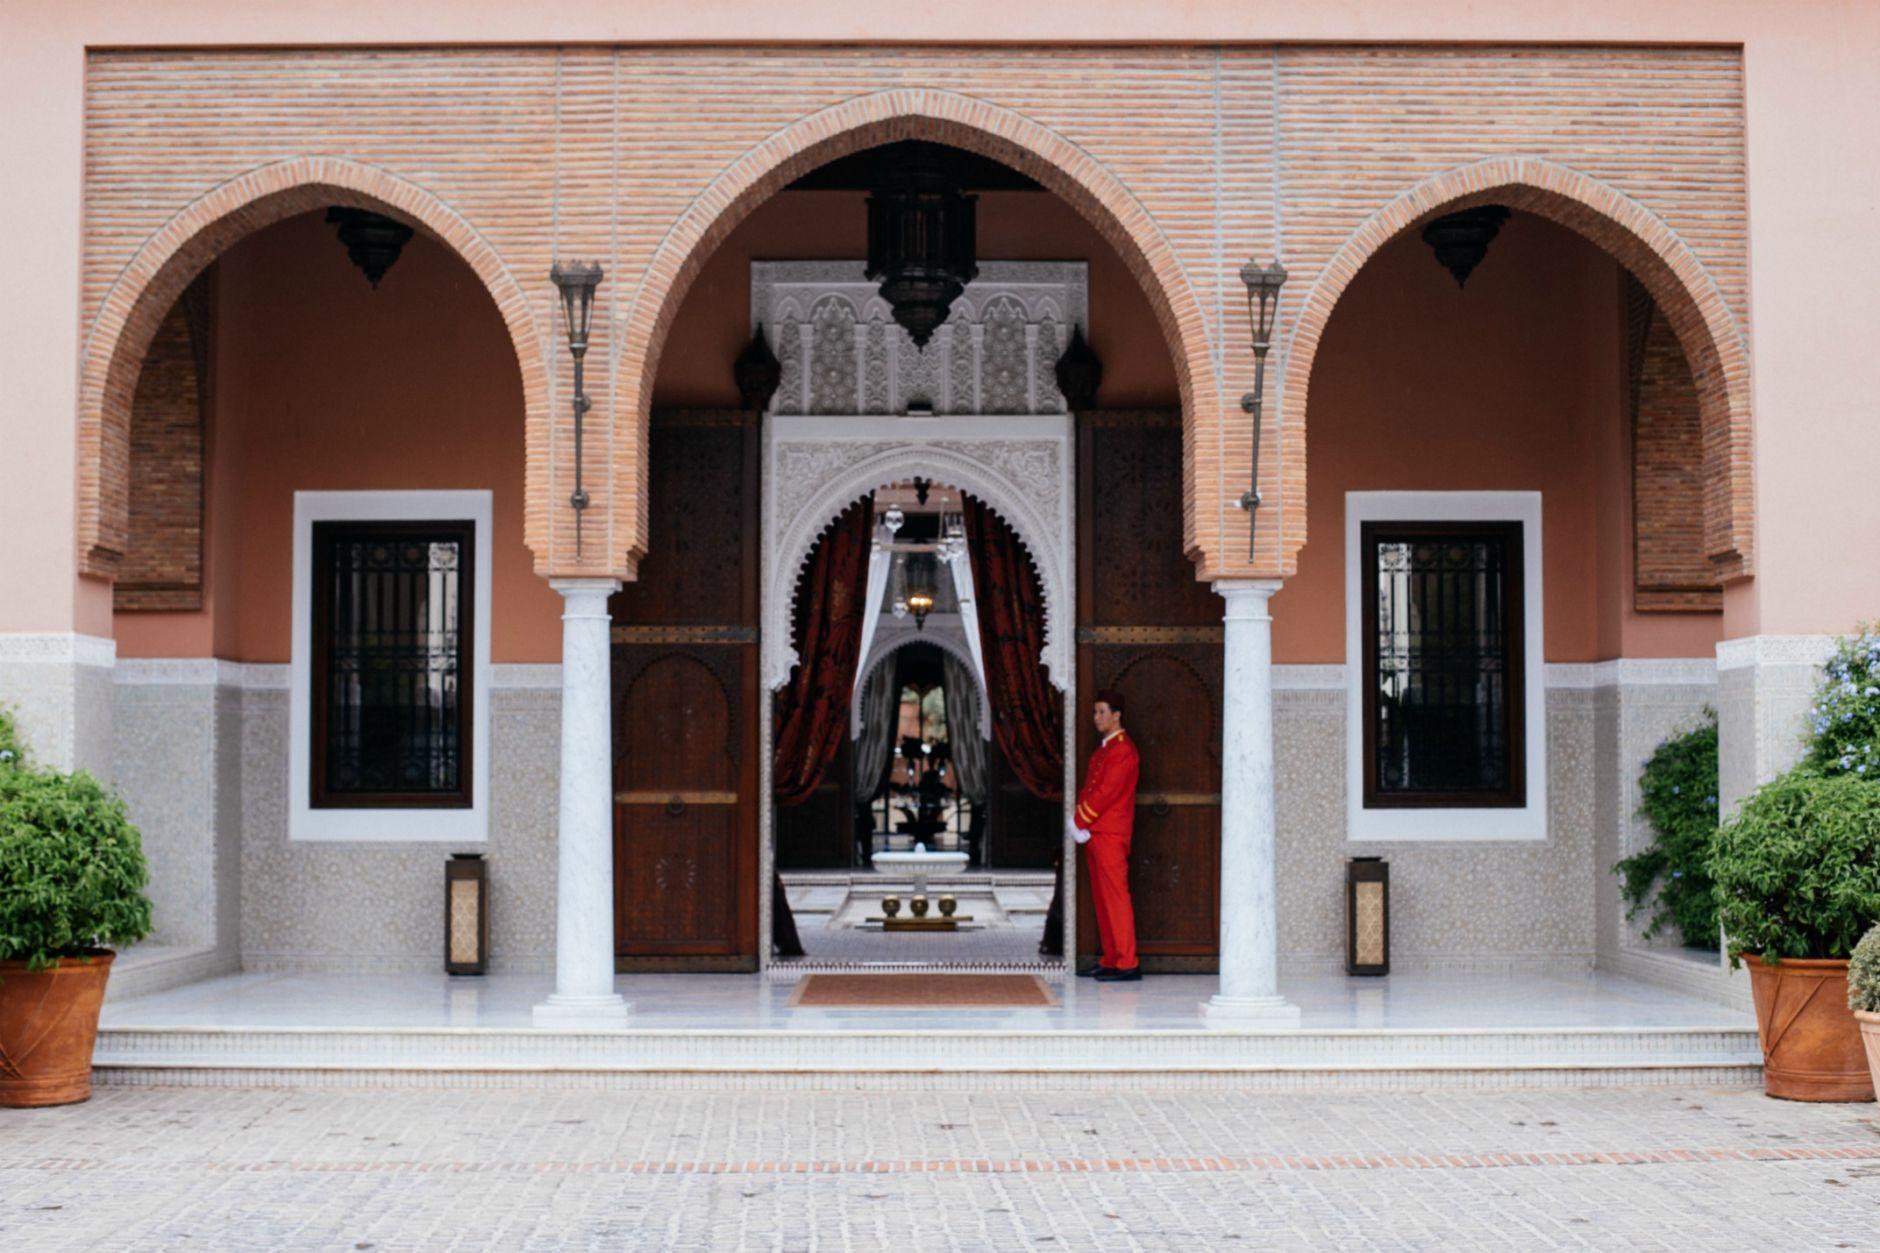 royal-mansour-hotel-luxury-marrakesch-marrakesh-morocco-edisa-shahini-disicouture-blog-02993y